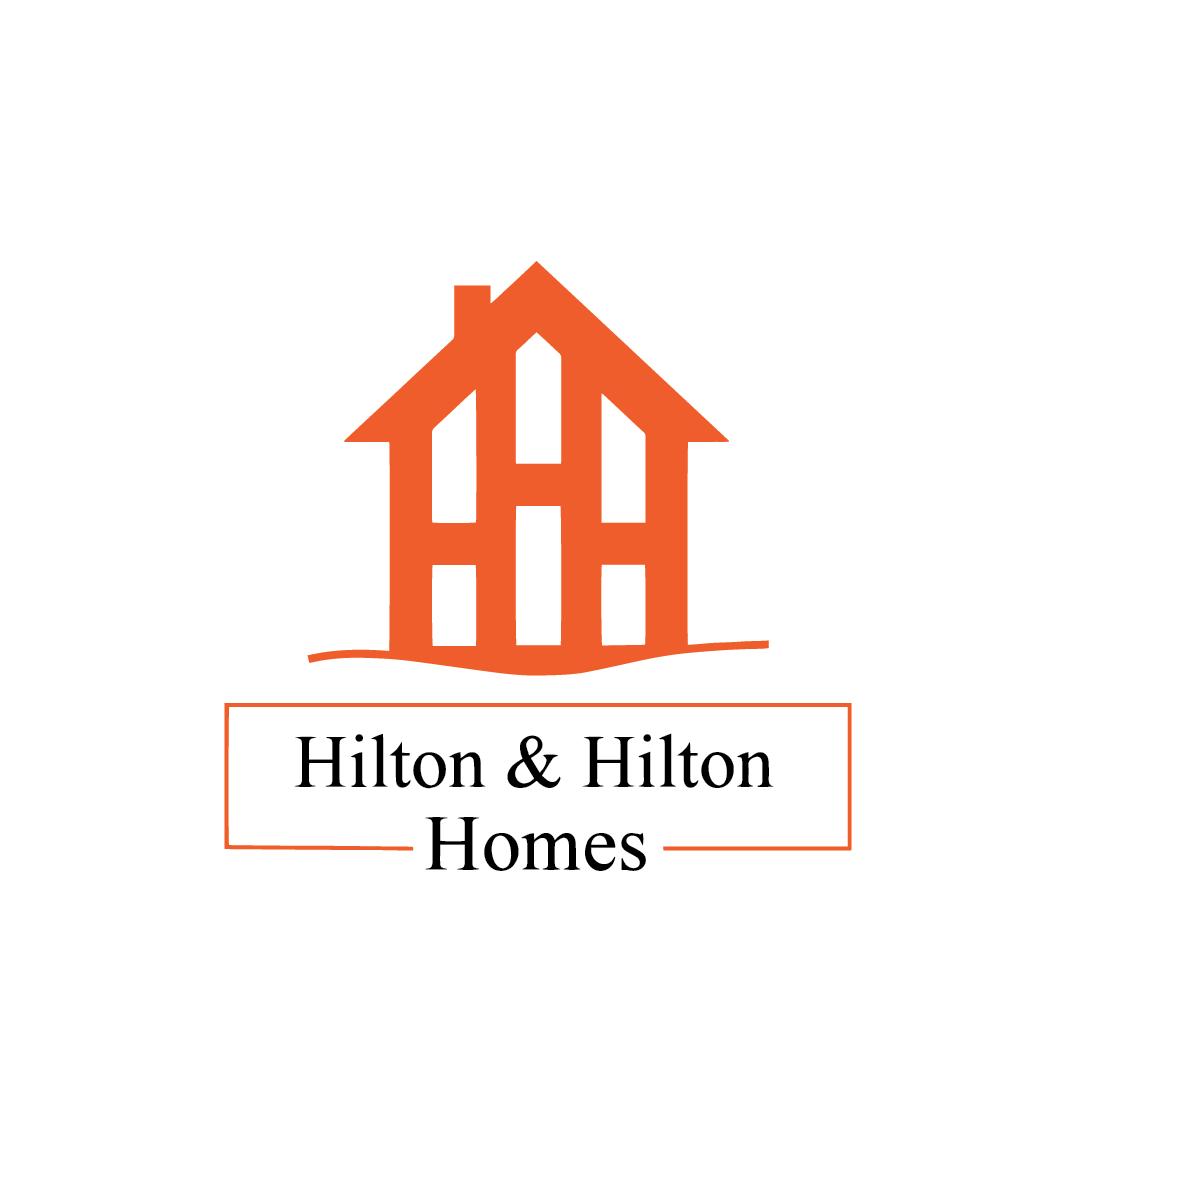 Hilton & Hilton Homes